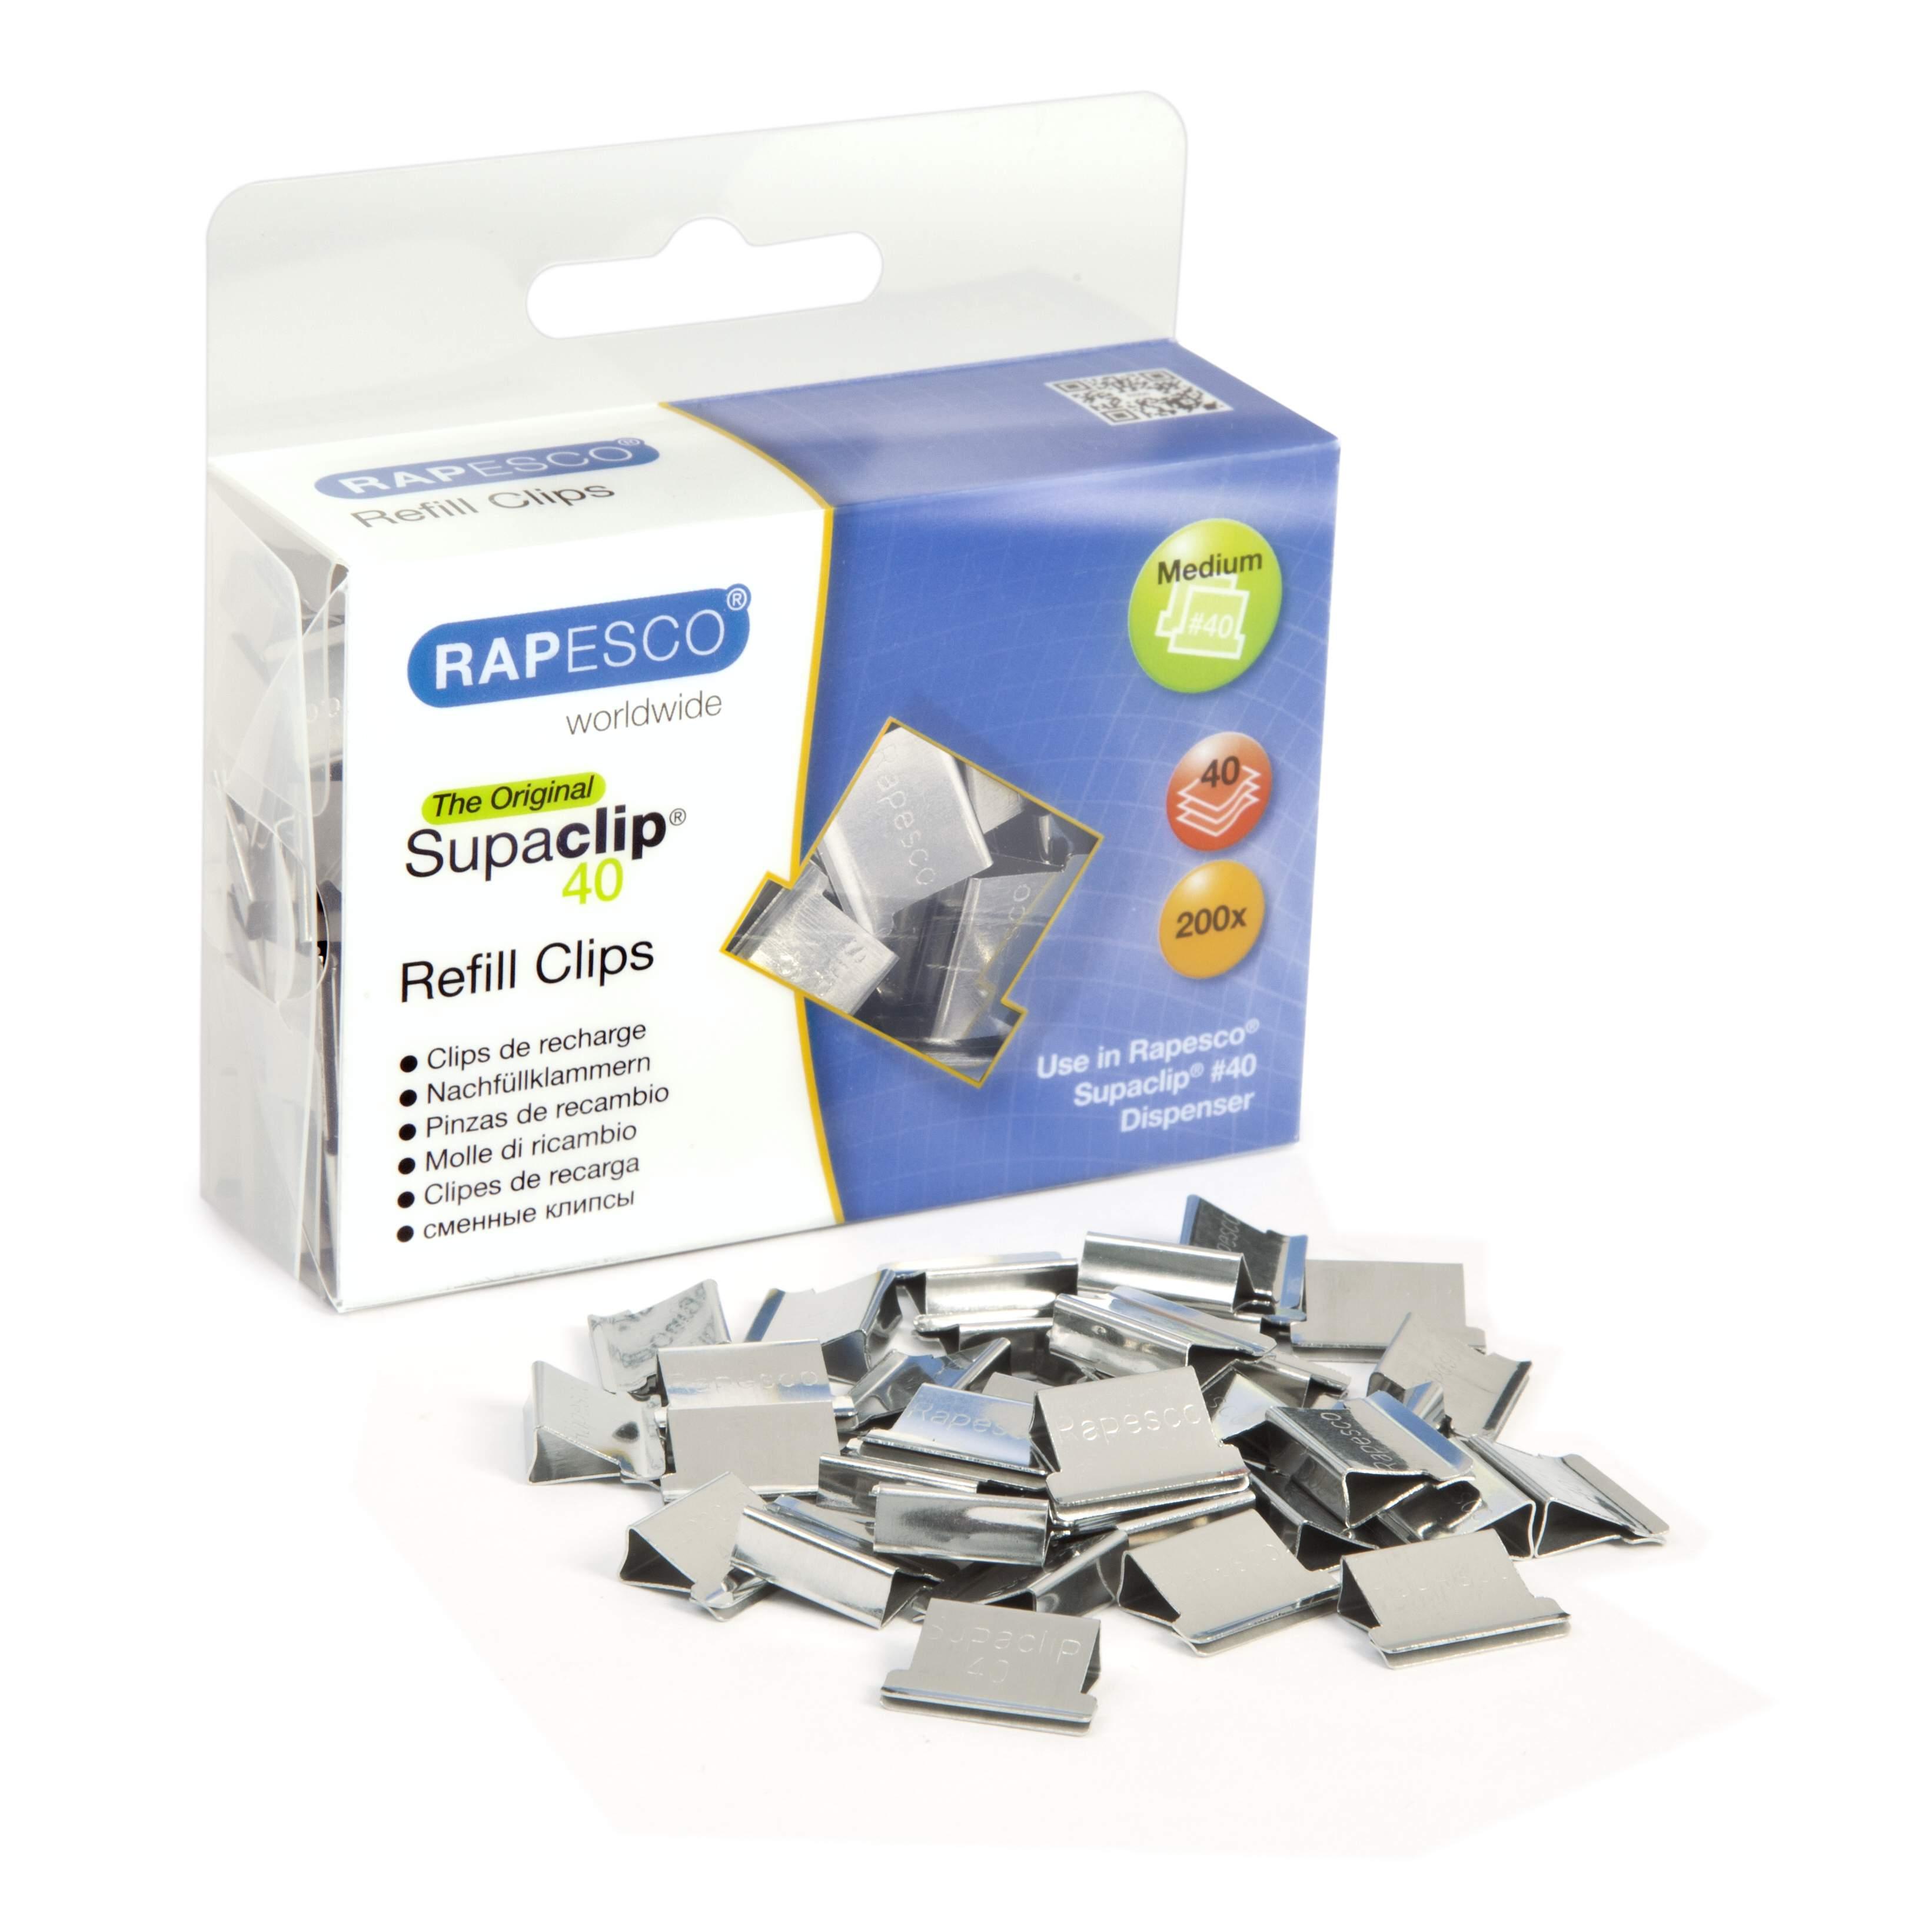 Rapesco Supaclip 40 Candy Pink Refill Clips X 100 Medium 40 Sheet Paper clip